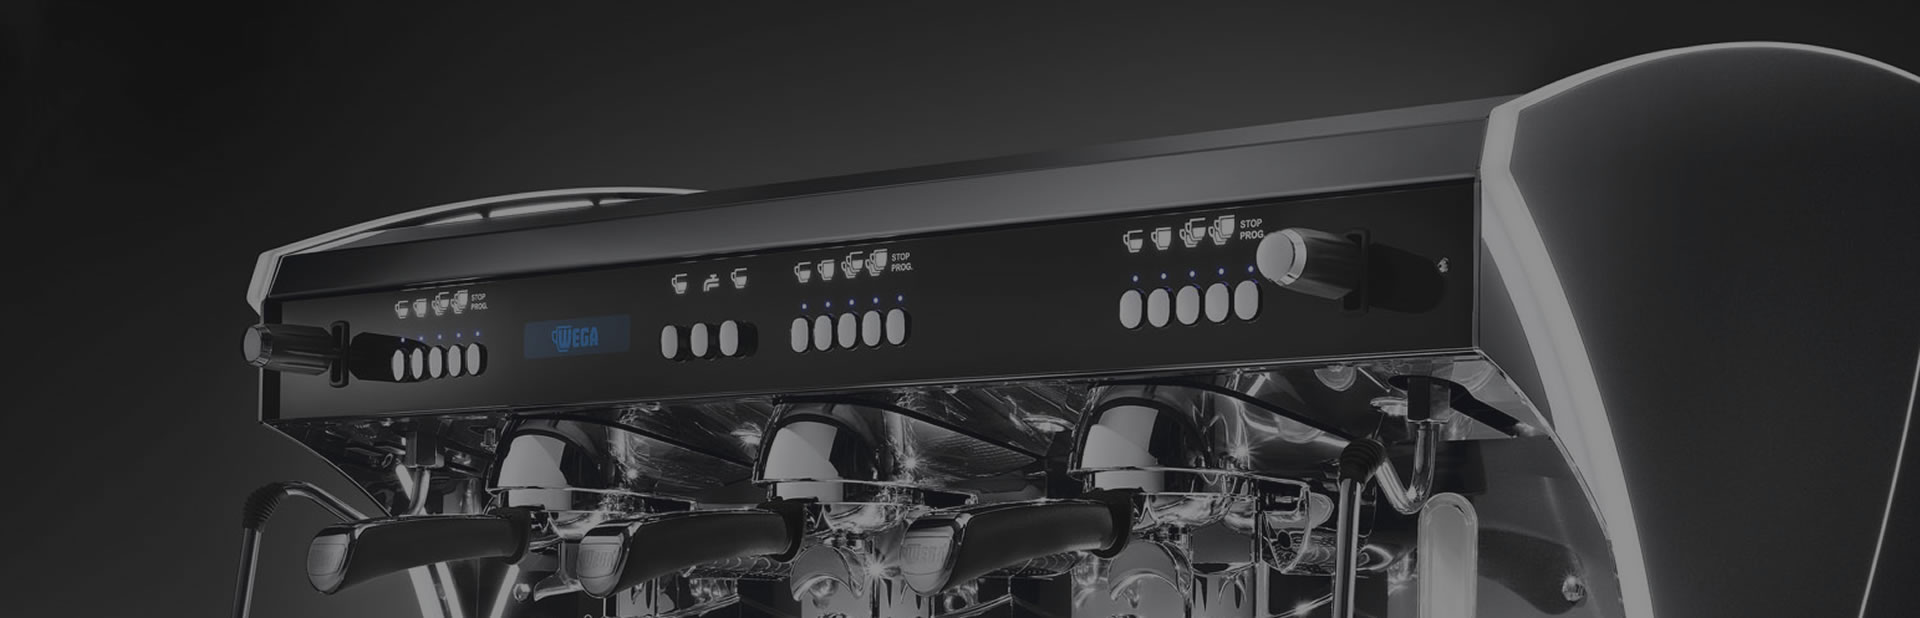 Commercial Grade Espresso Machines - Bali Roaster